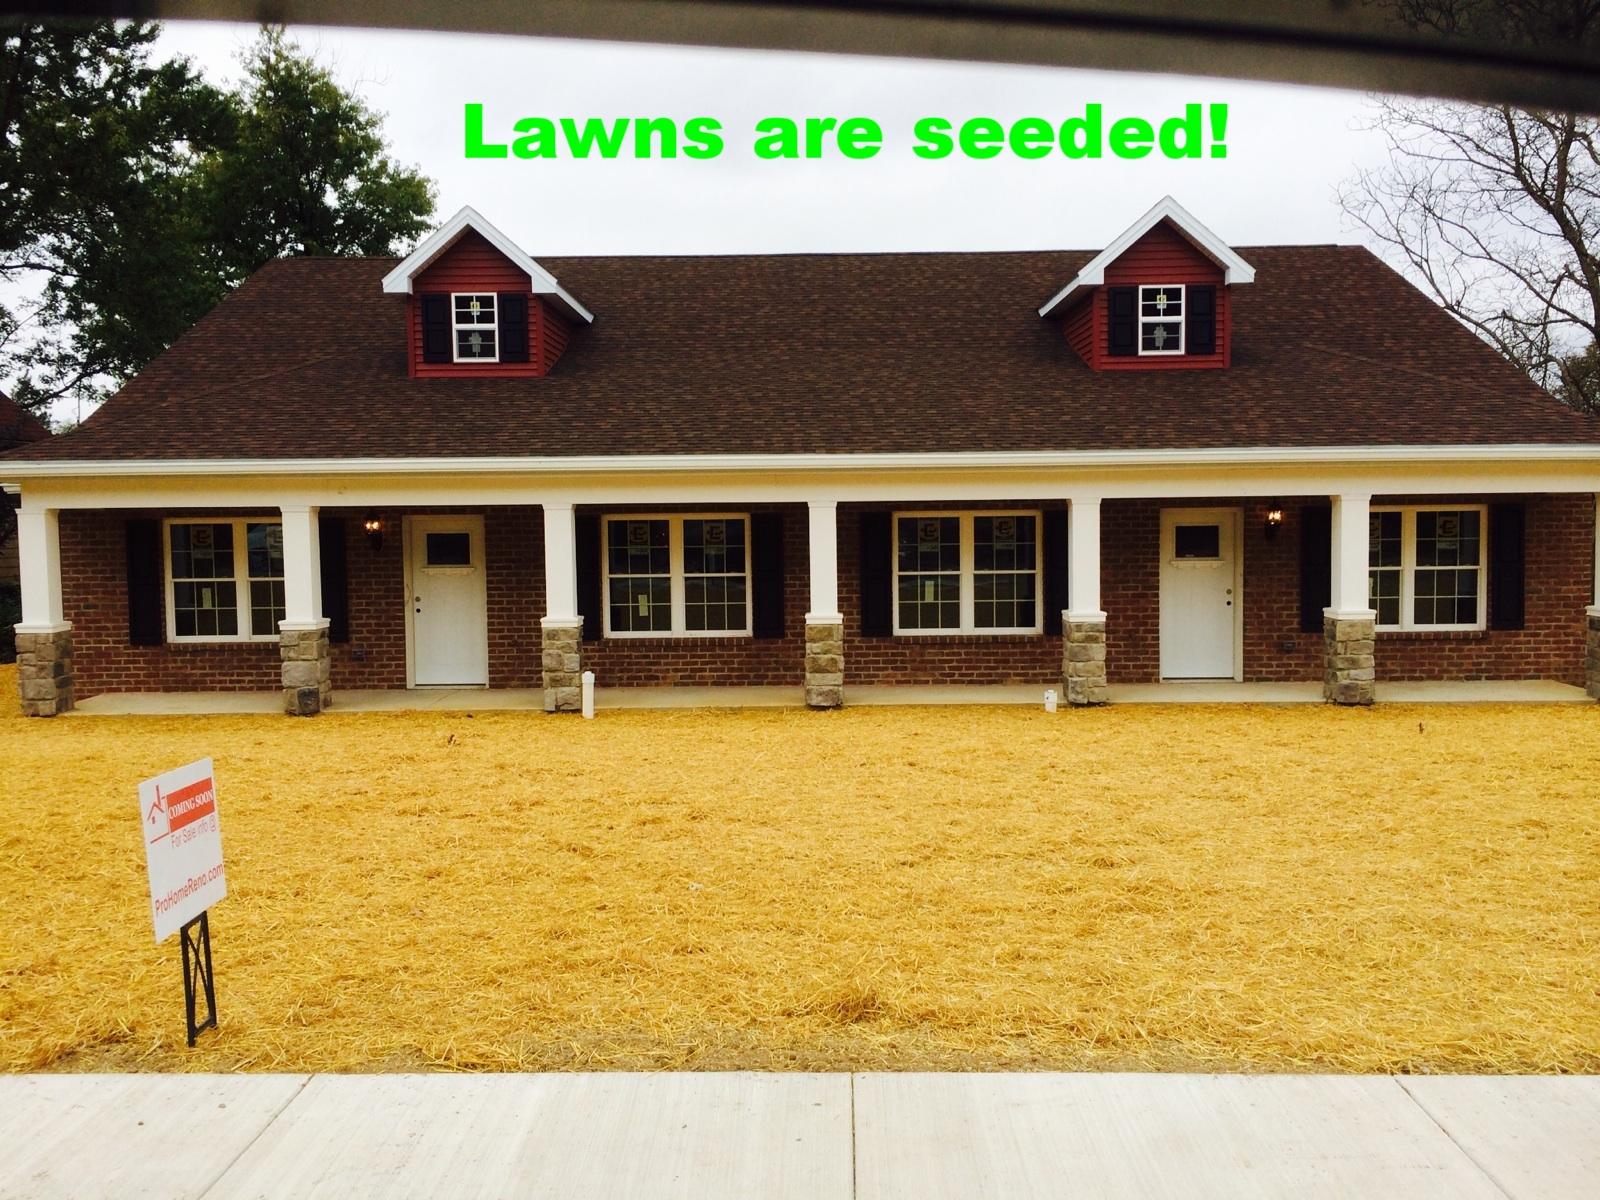 10.23.17_lawns seeded.jpg